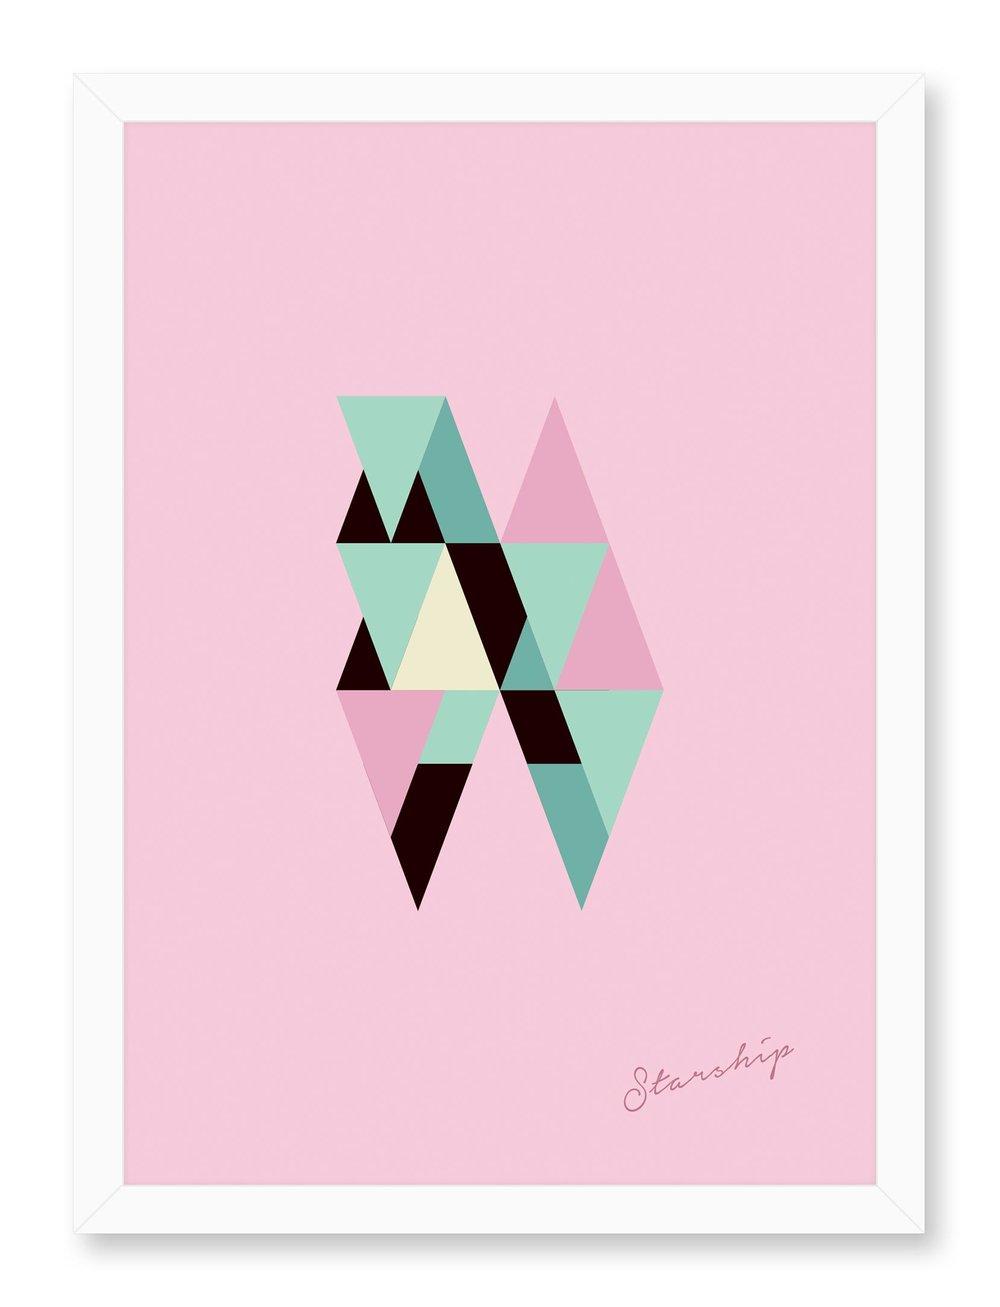 starship_pink_white.jpg